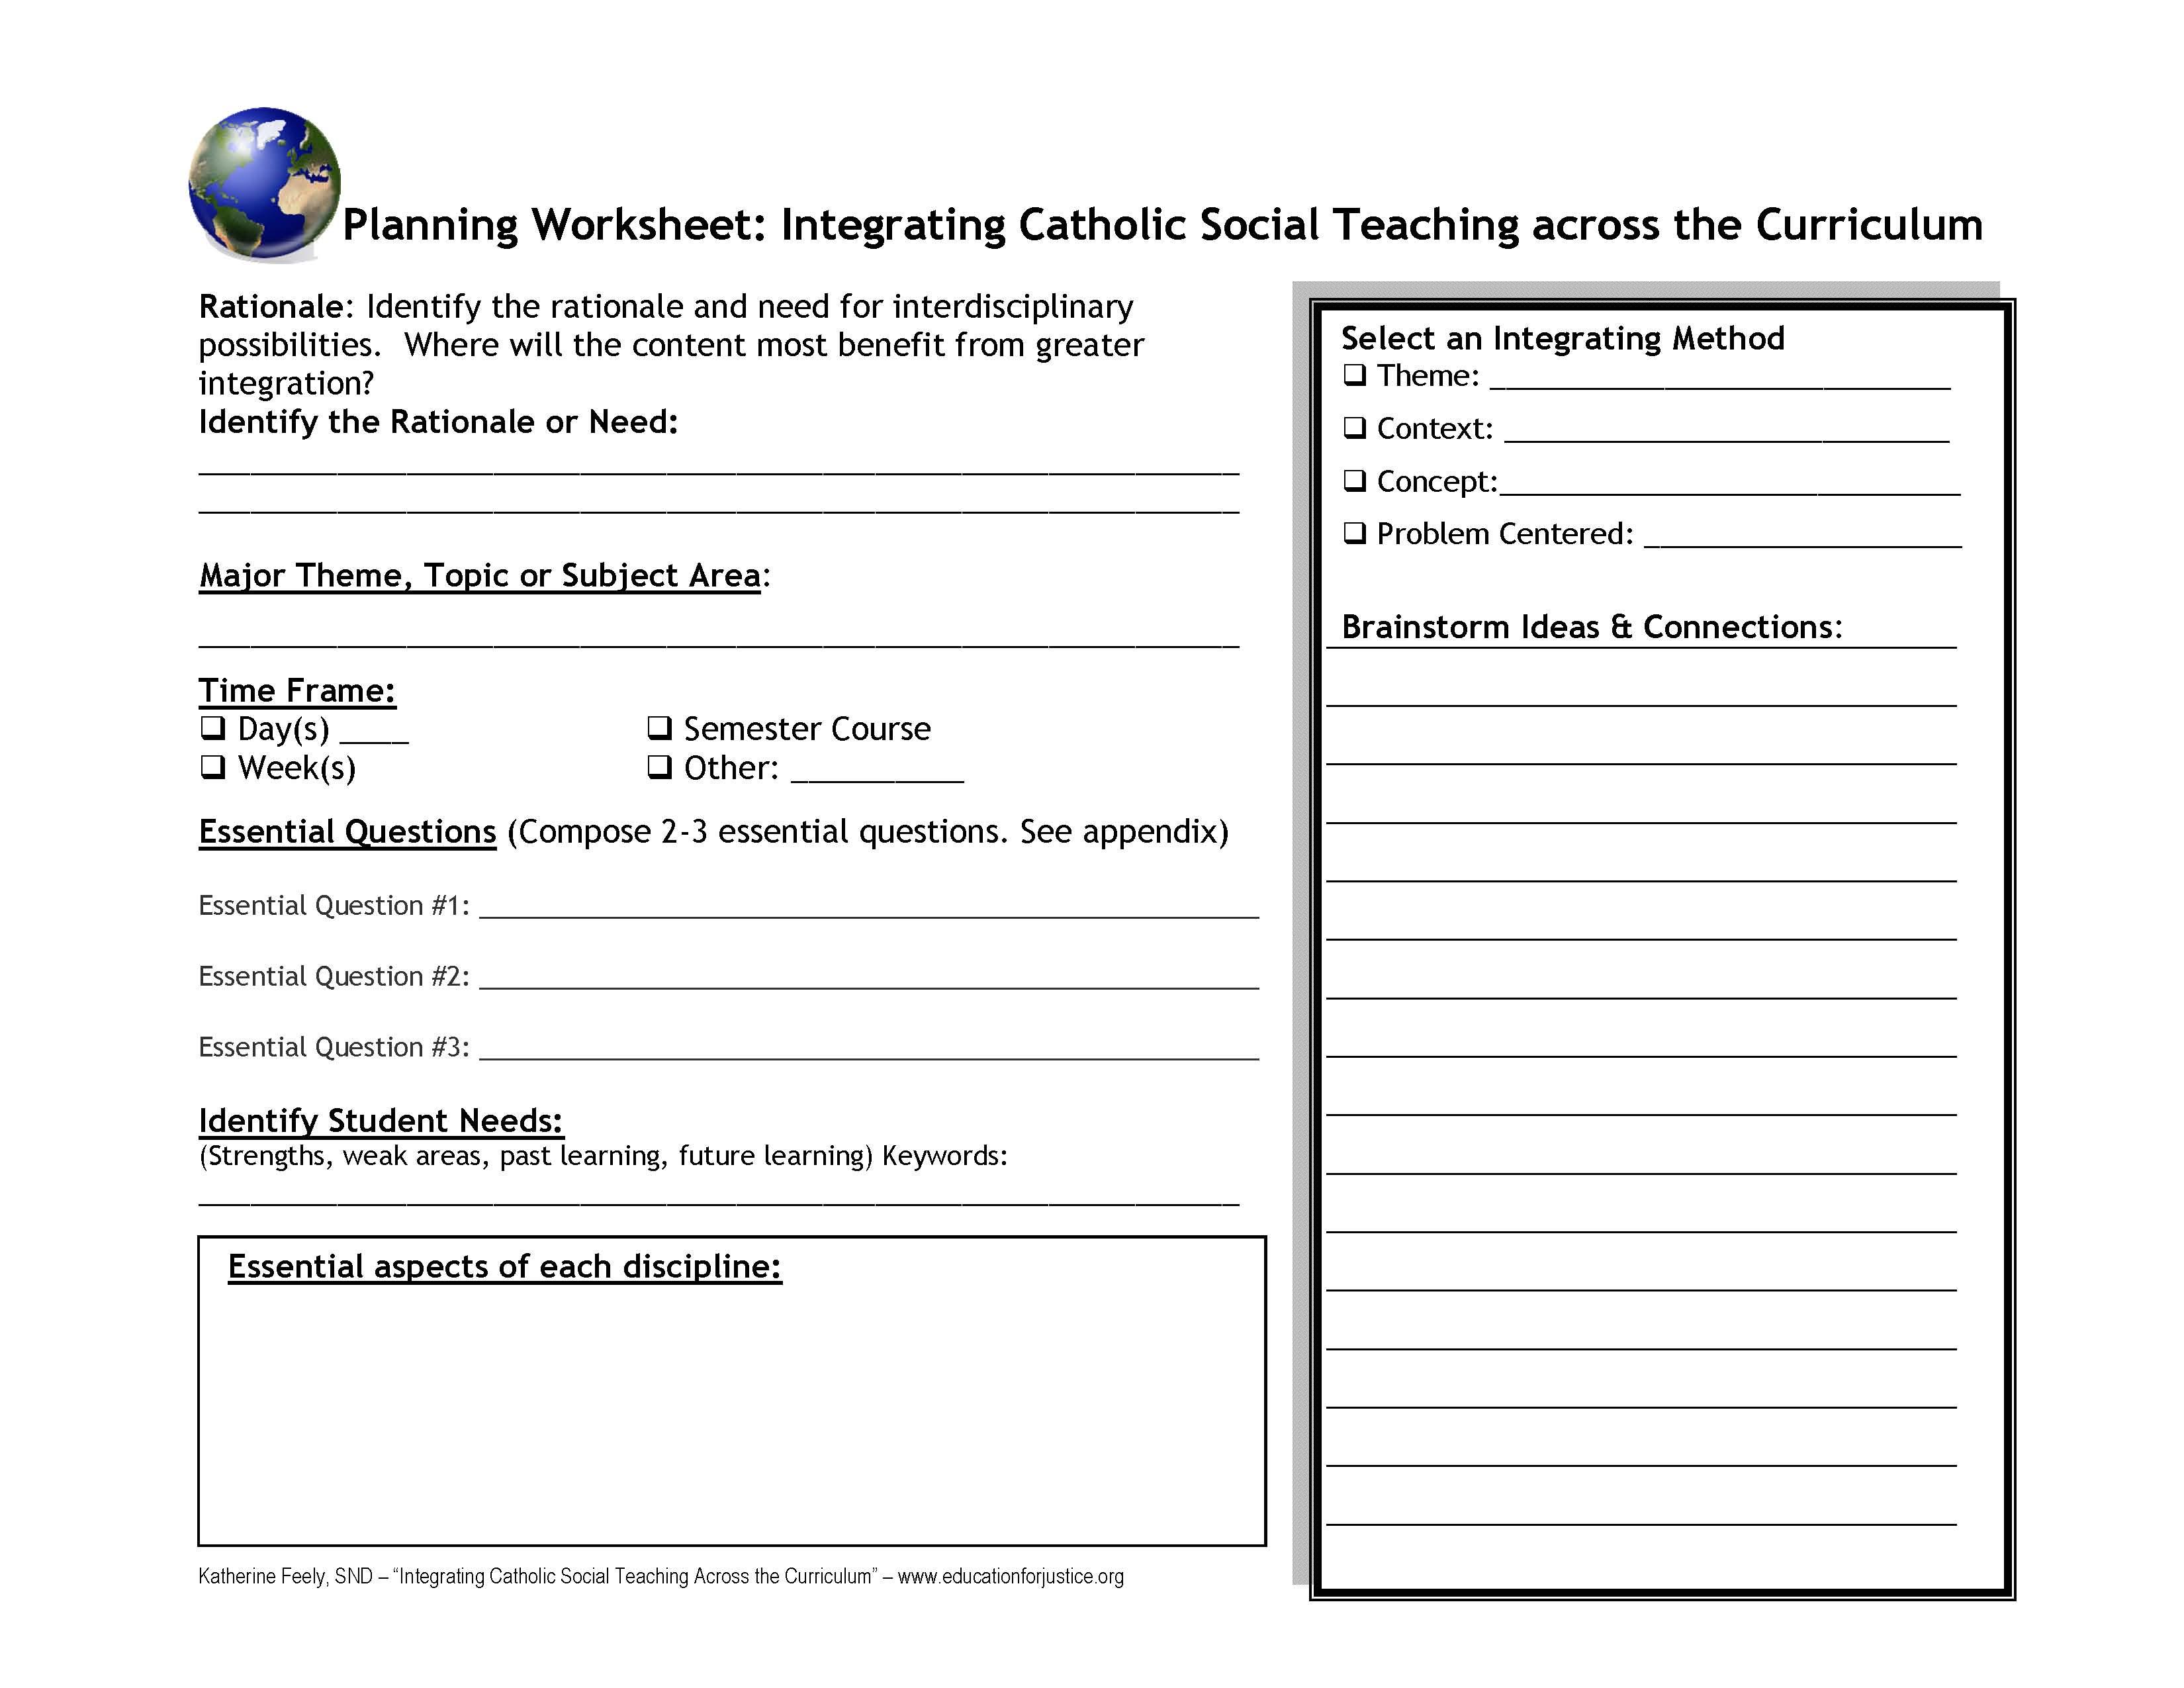 Planning Worksheet For Integrating Catholic Social